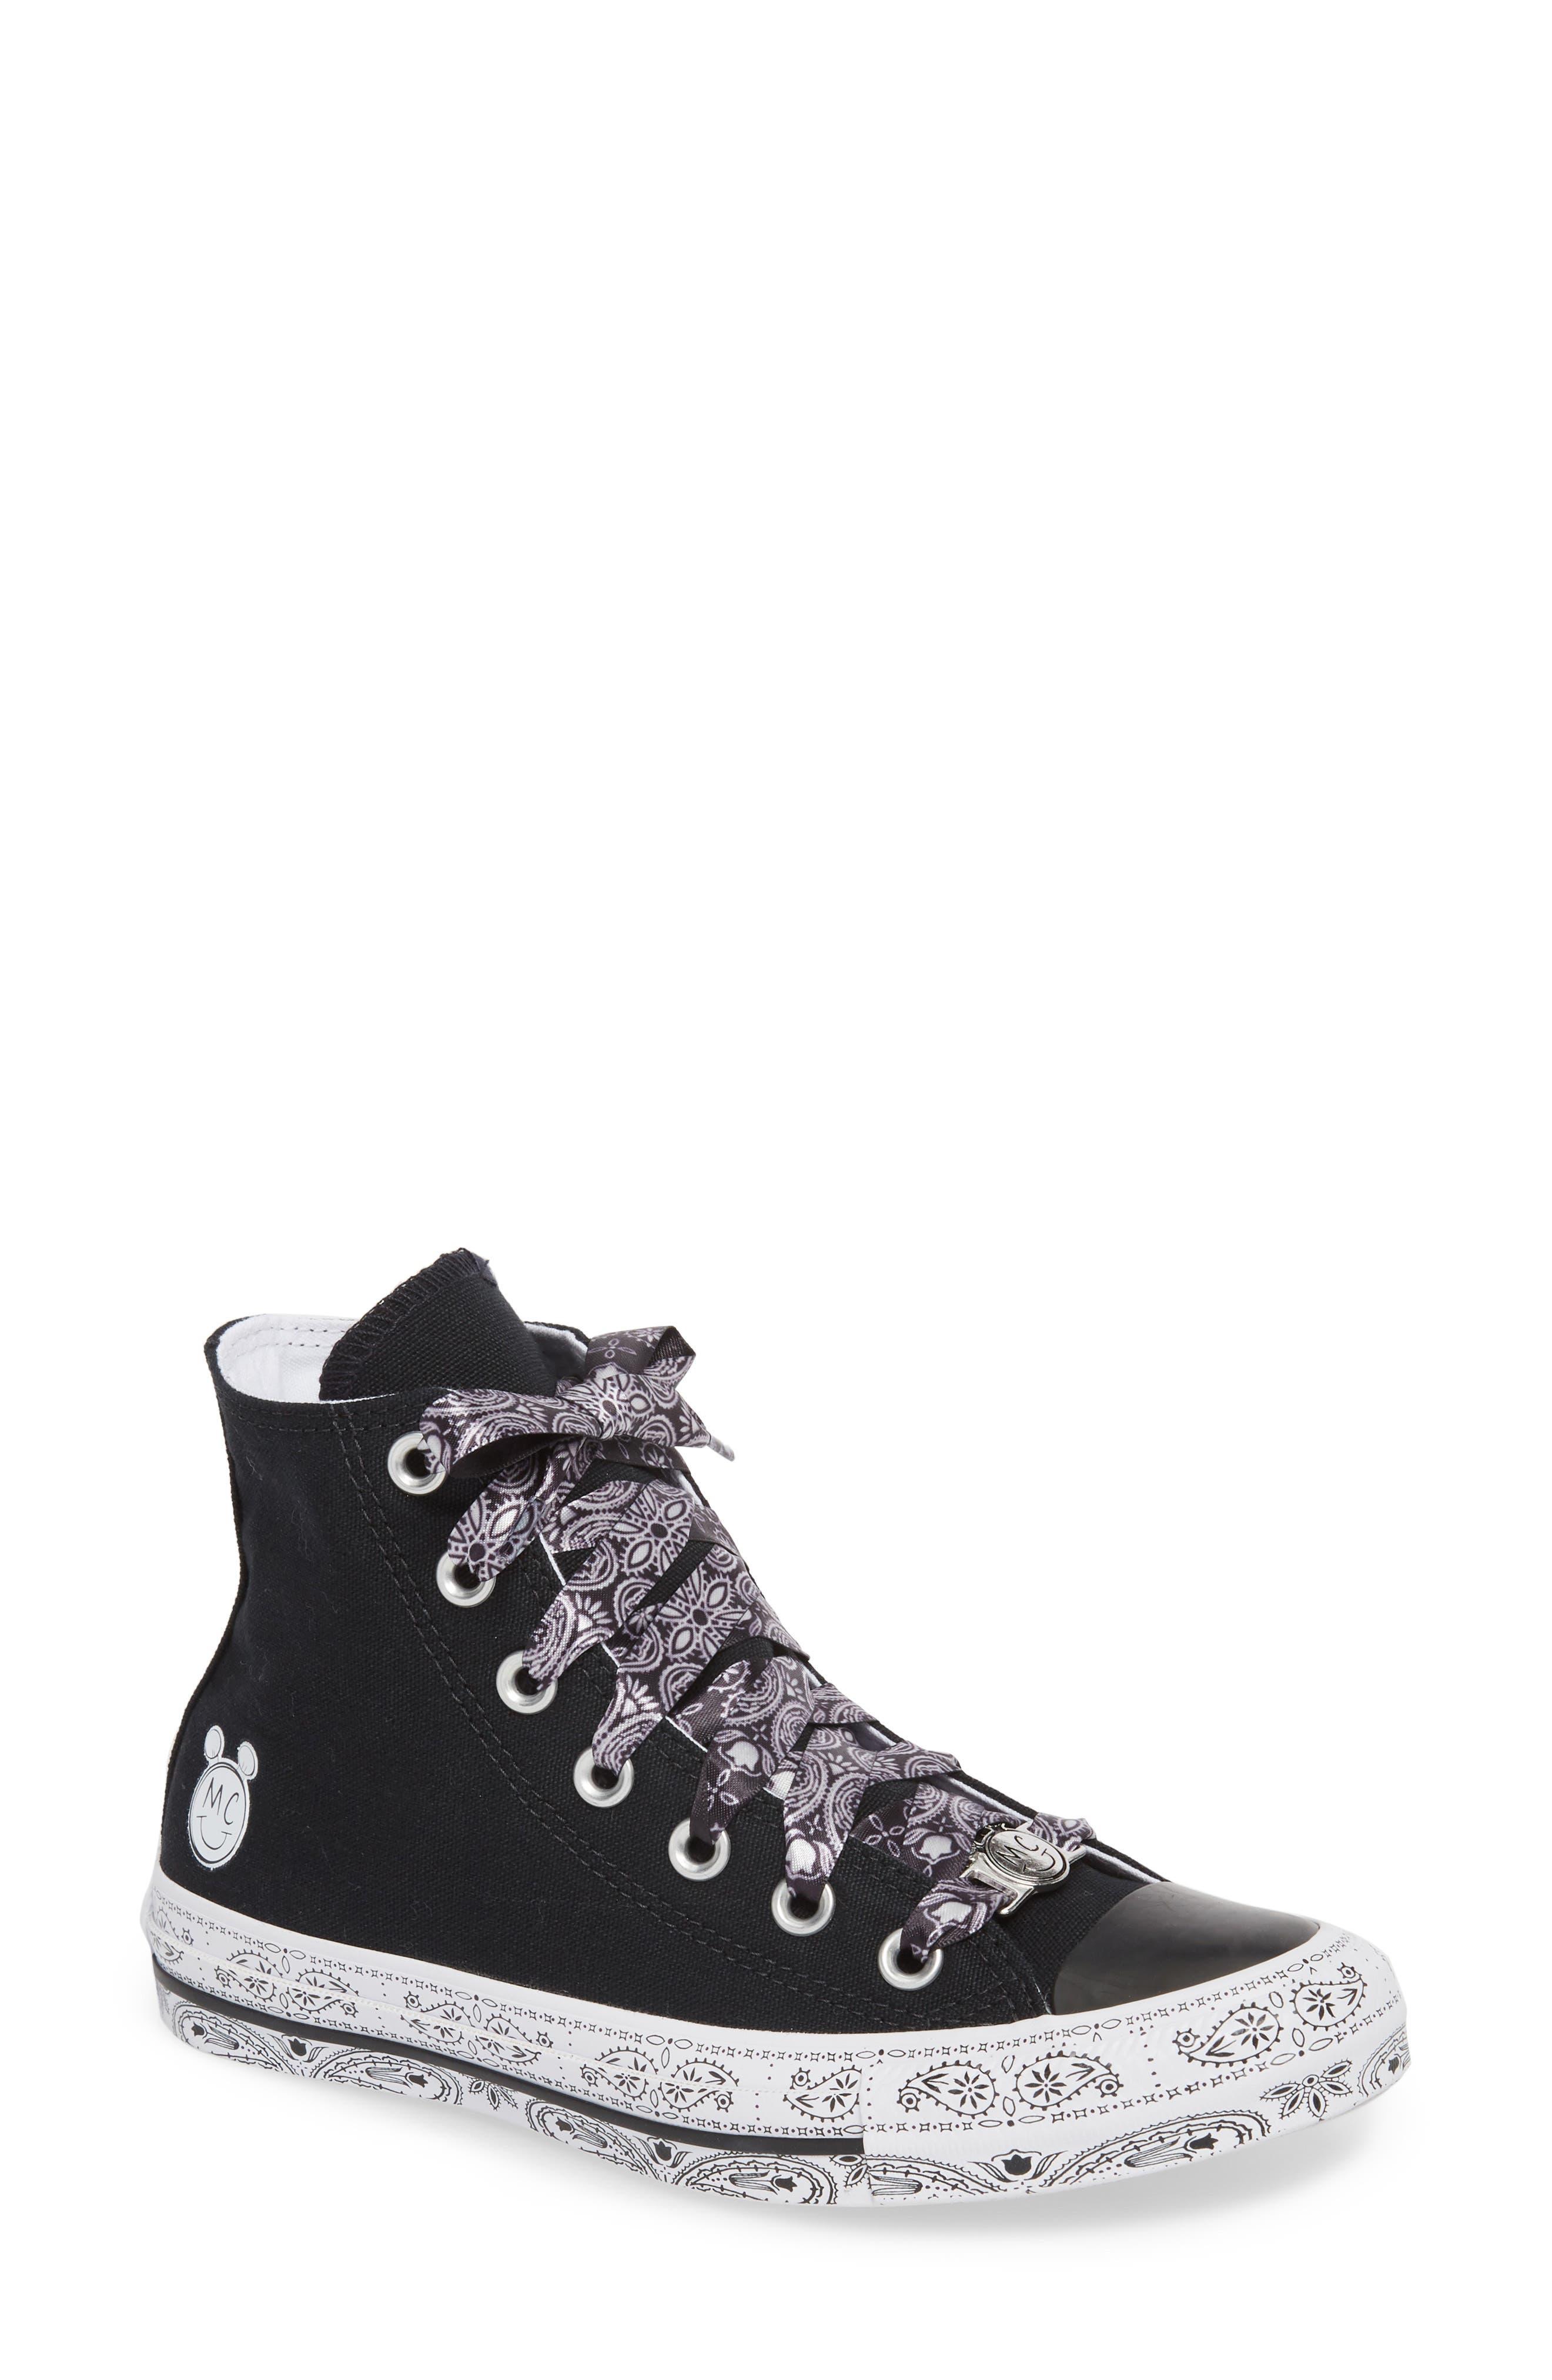 CONVERSE,                             x Miley Cyrus Chuck Taylor All Star Bandana High Top Sneaker,                             Main thumbnail 1, color,                             001